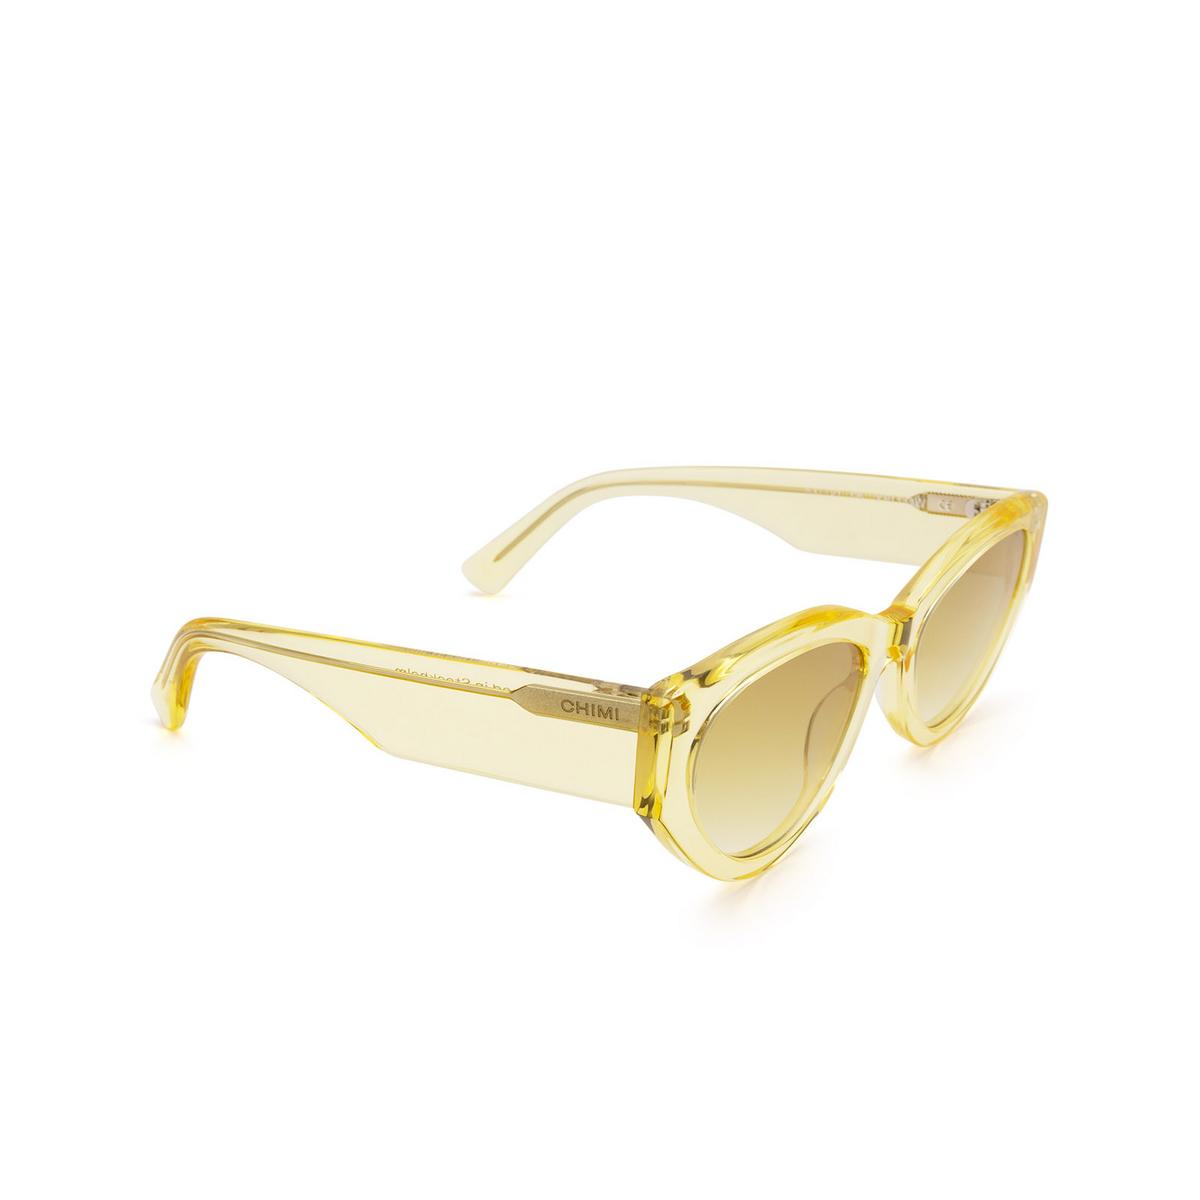 Chimi® Cat-eye Sunglasses: 06 color Yellow - three-quarters view.